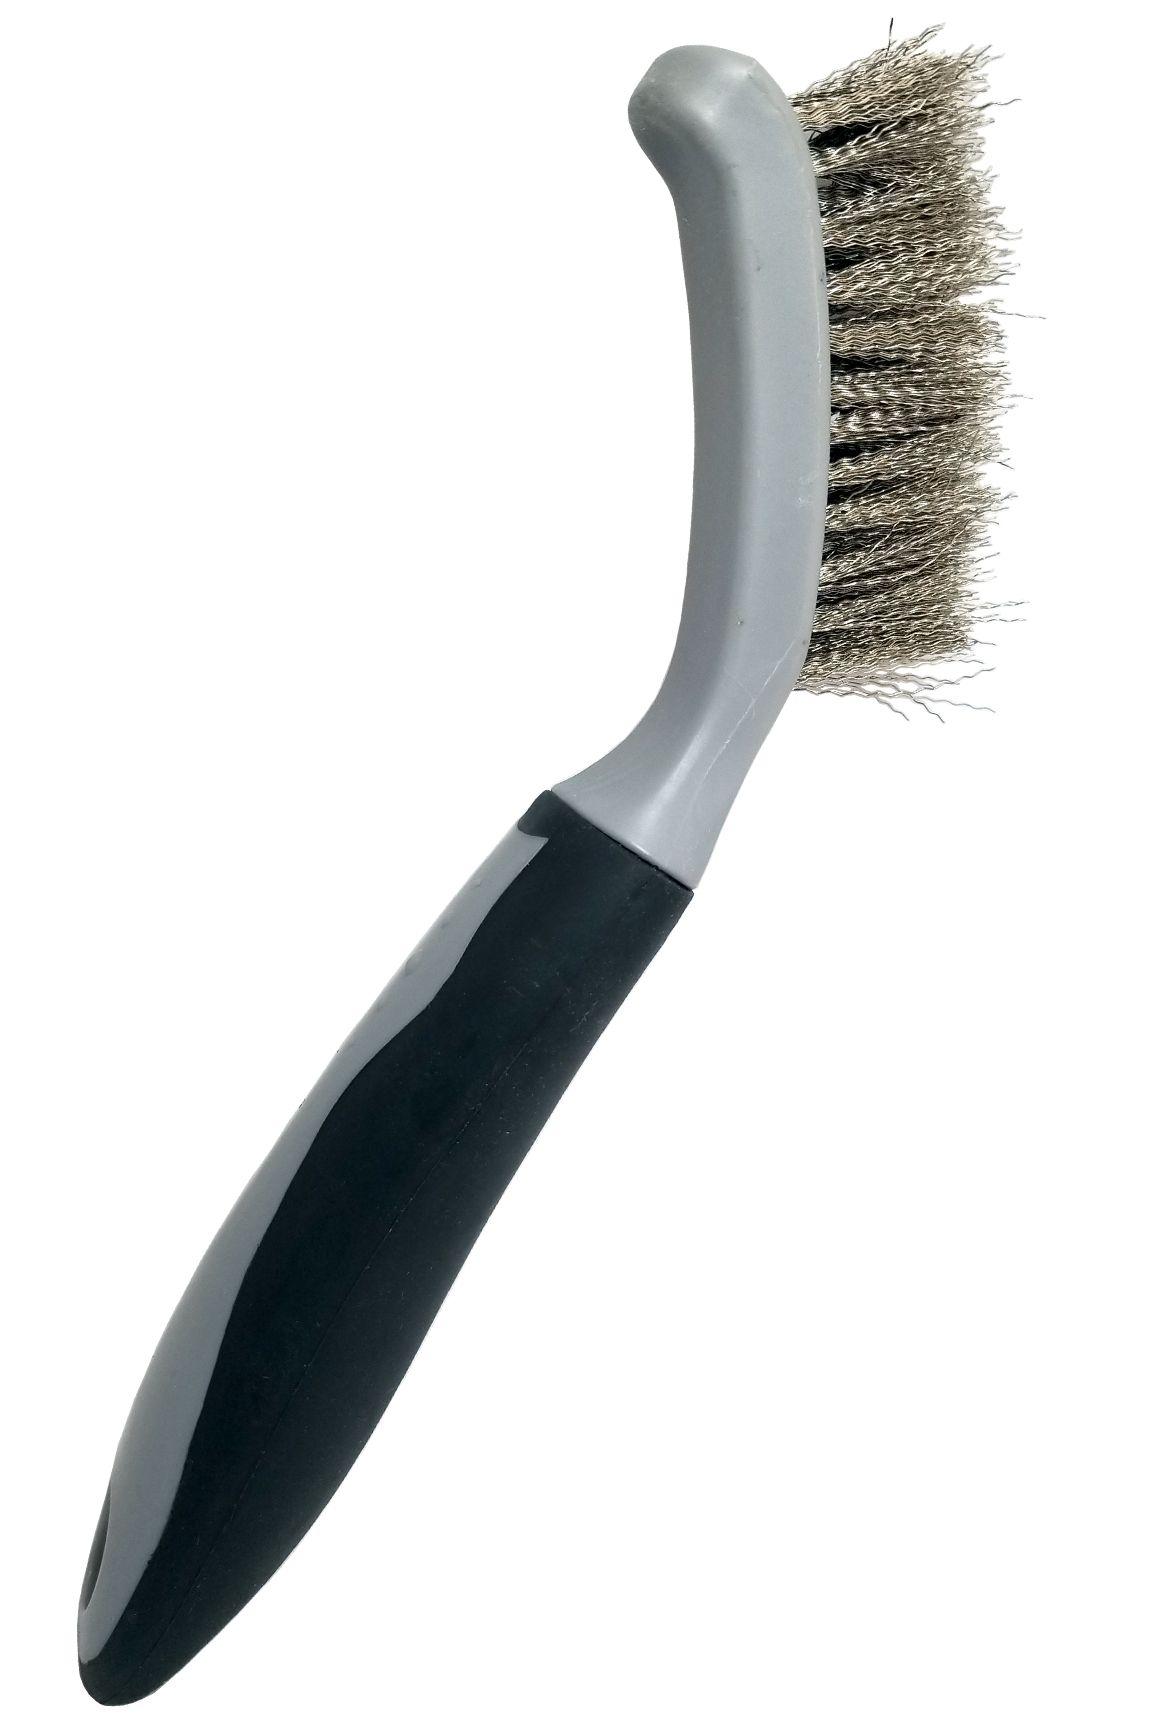 Wire Bristle Scrub Brush In 2020 Scrub Brush Stainless Steel Wire Wire Brushes